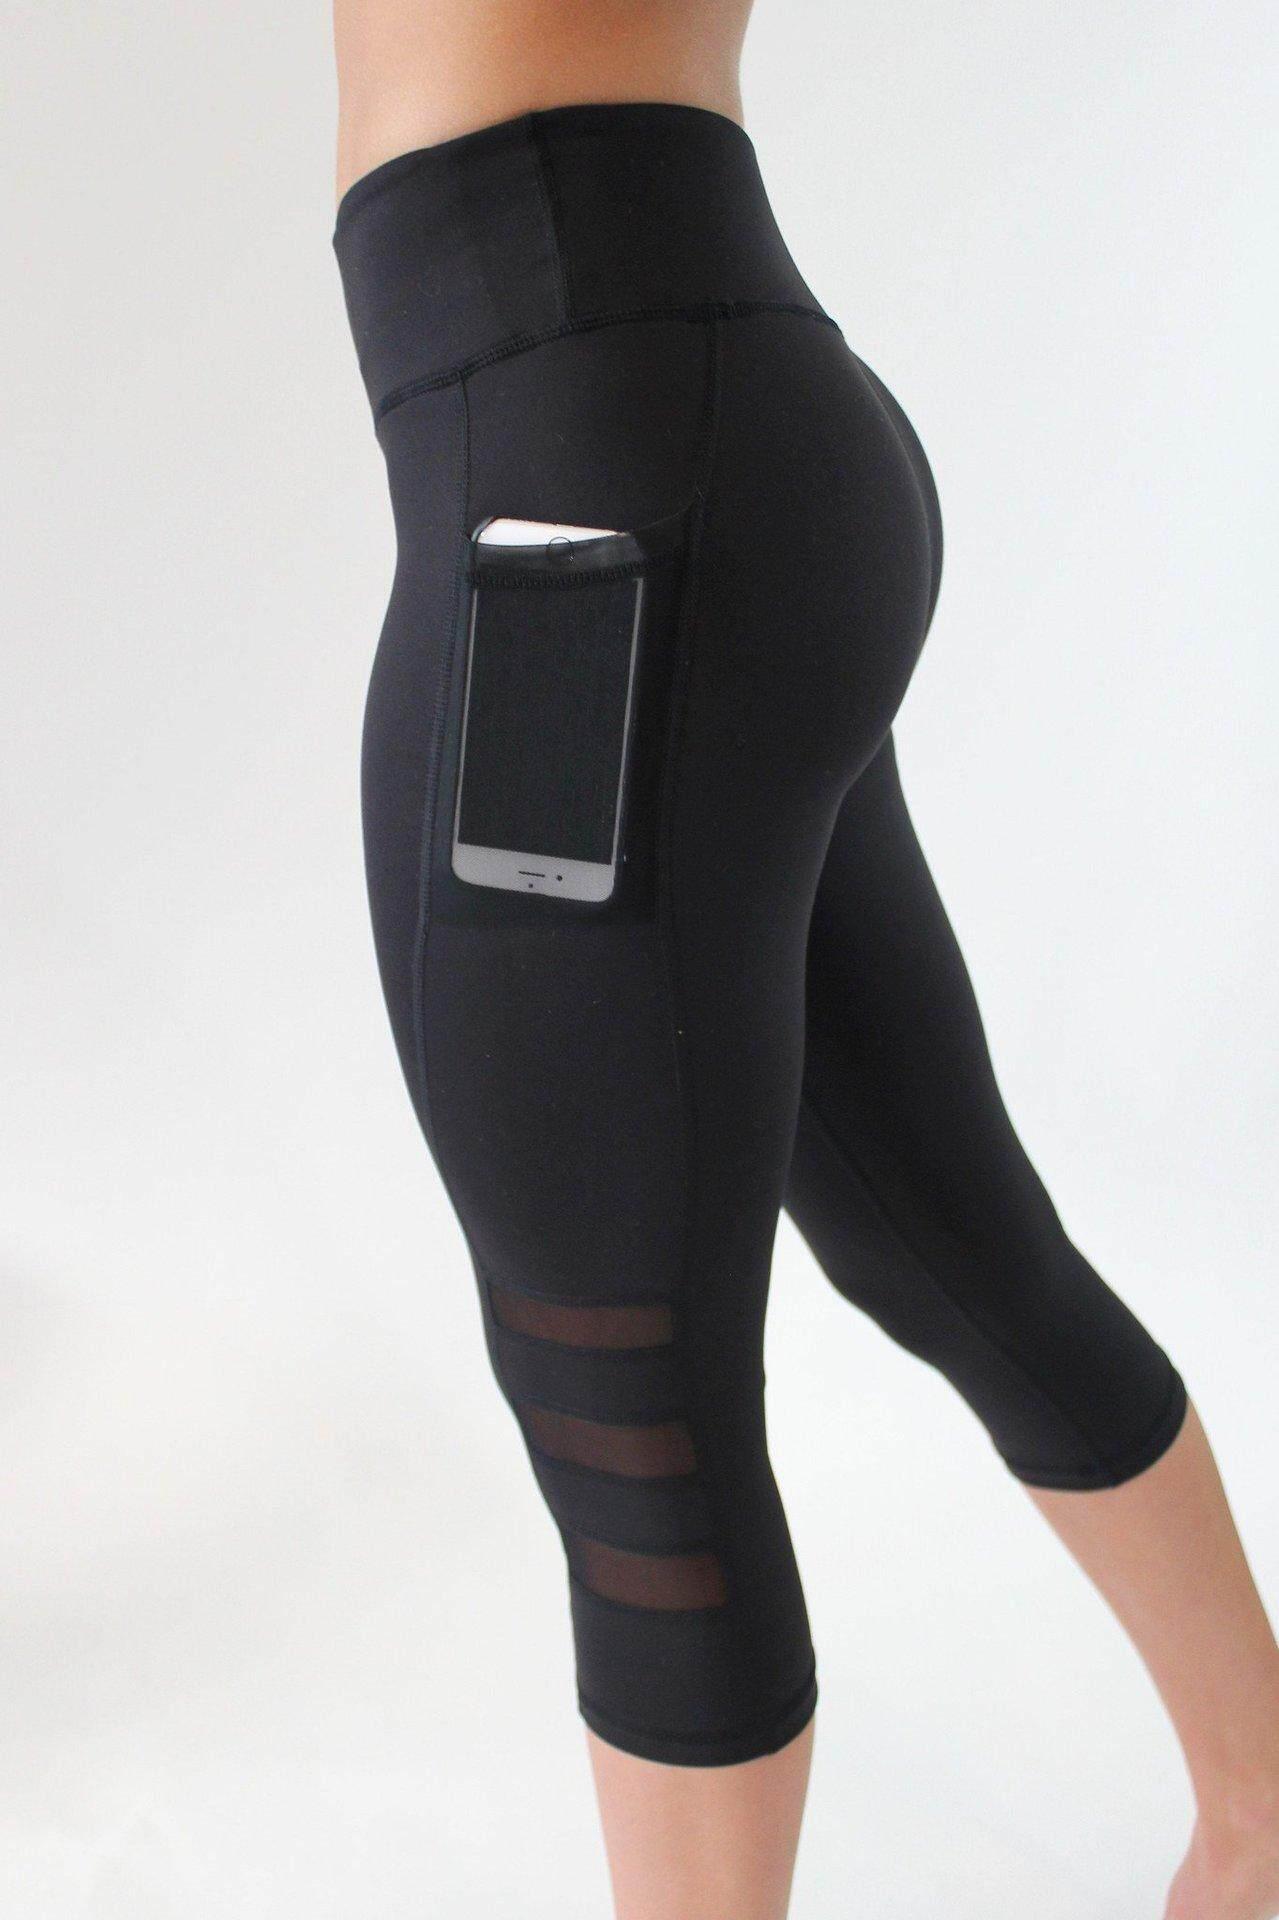 44f02b6c03 Women's Sport Pants - Buy Women's Sport Pants at Best Price in ...